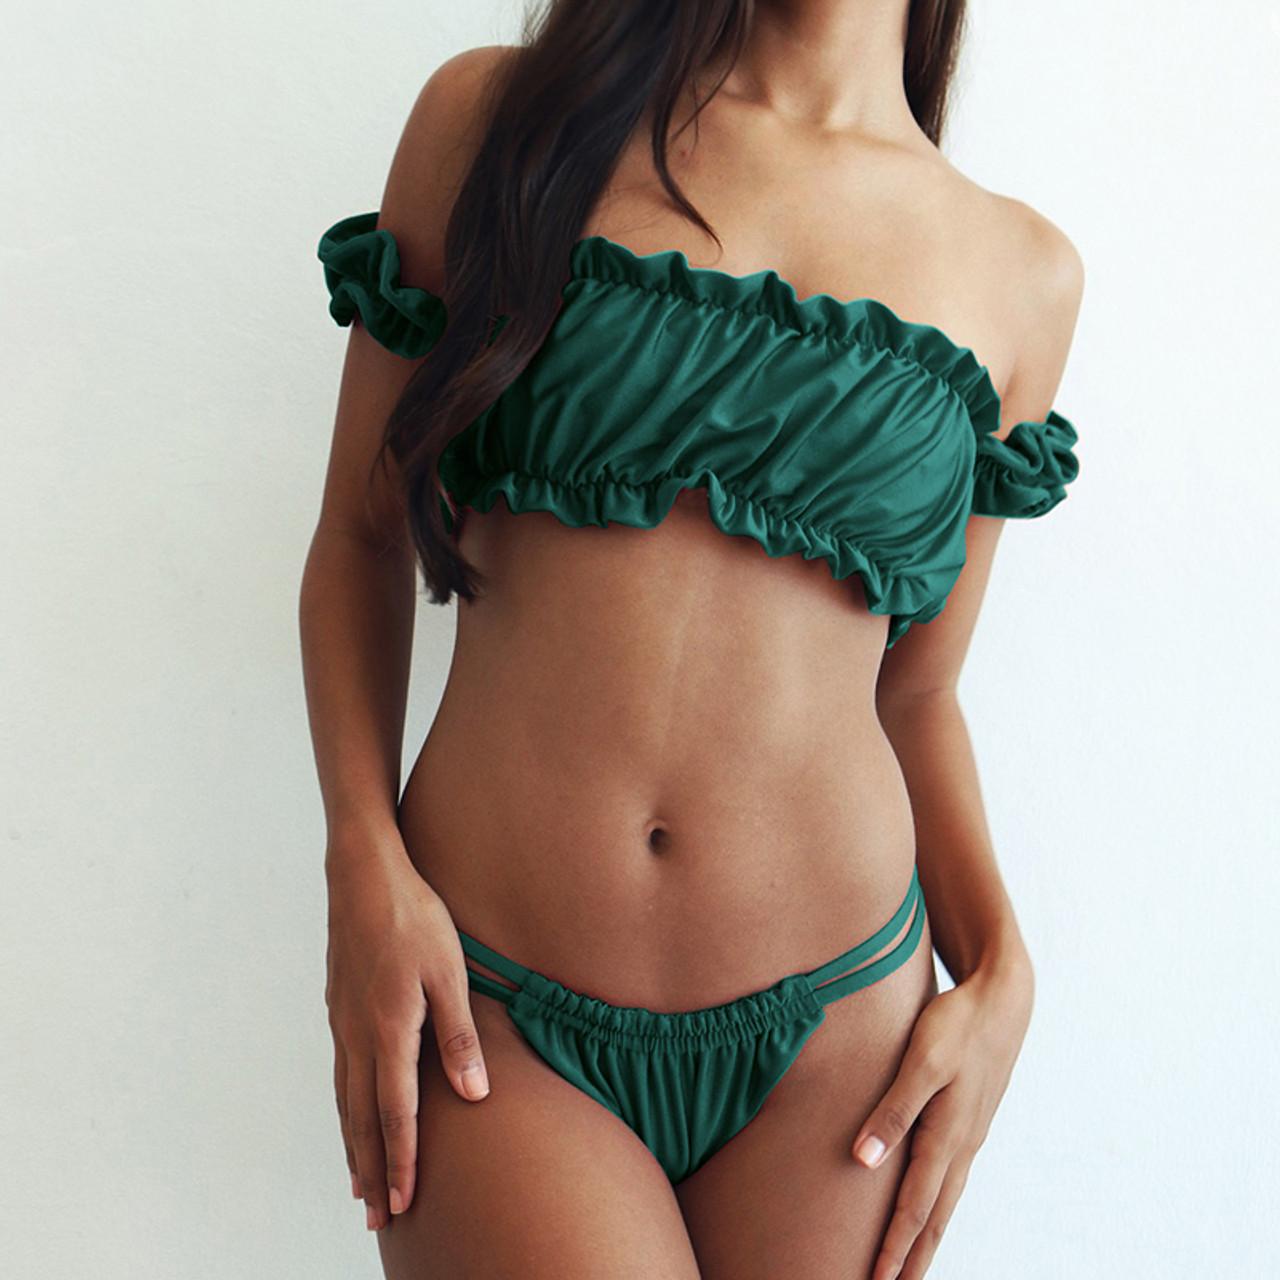 504af67bec3 Bandage Brazilian Bikini 2019 swimming suit Women Swimwear Push ...